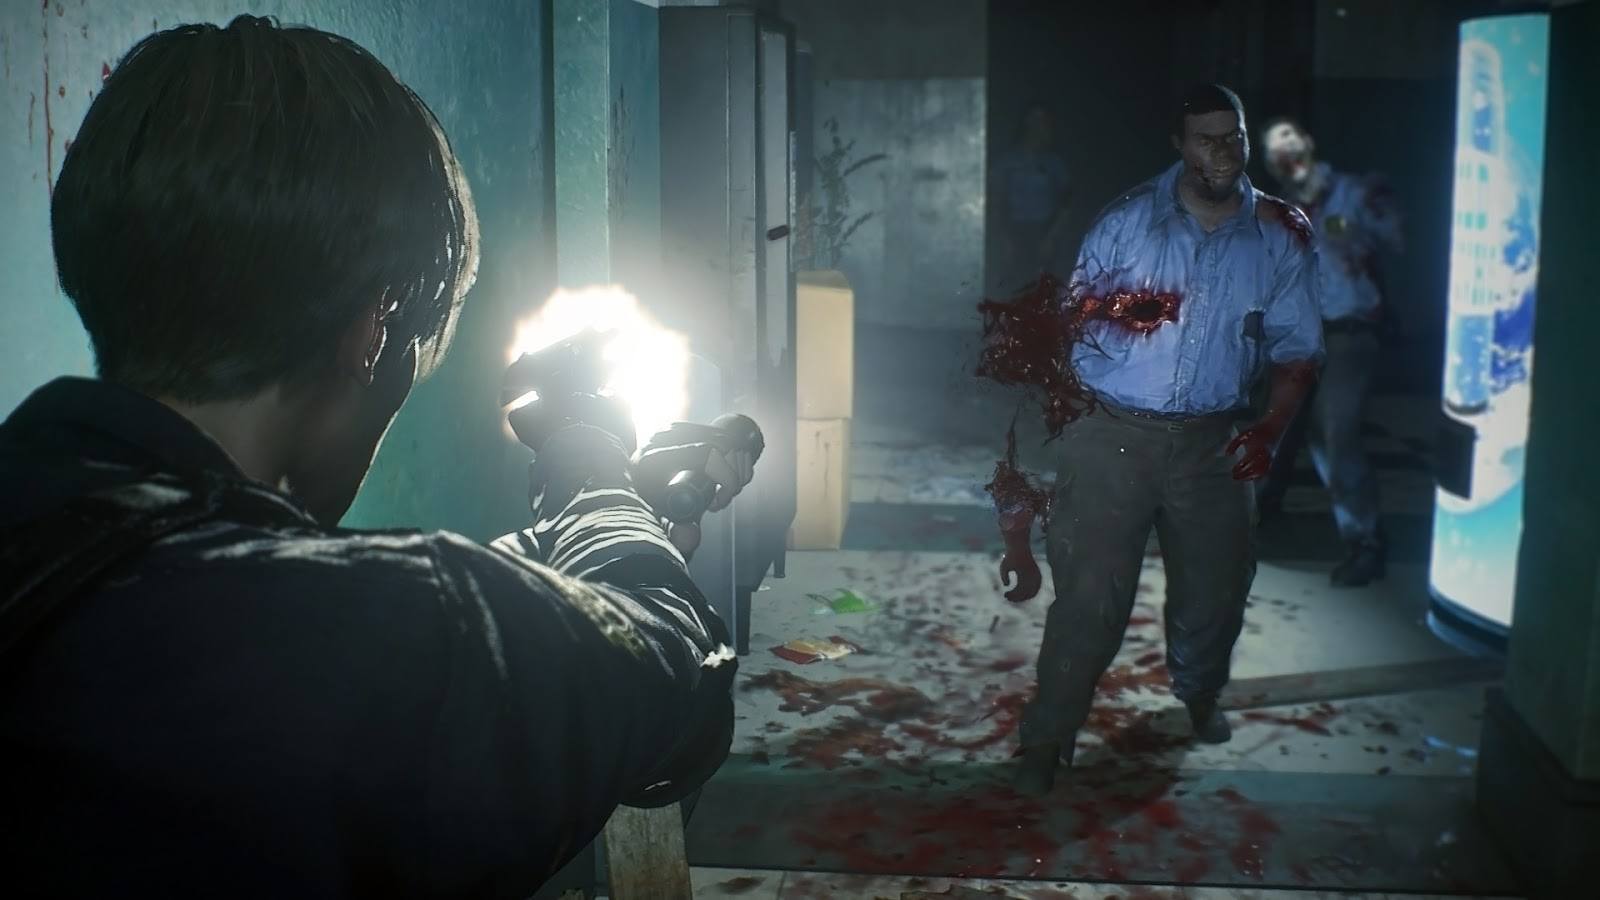 [E3 2018] Ya tenemos trailer y fecha para Resident Evil 2 Remake